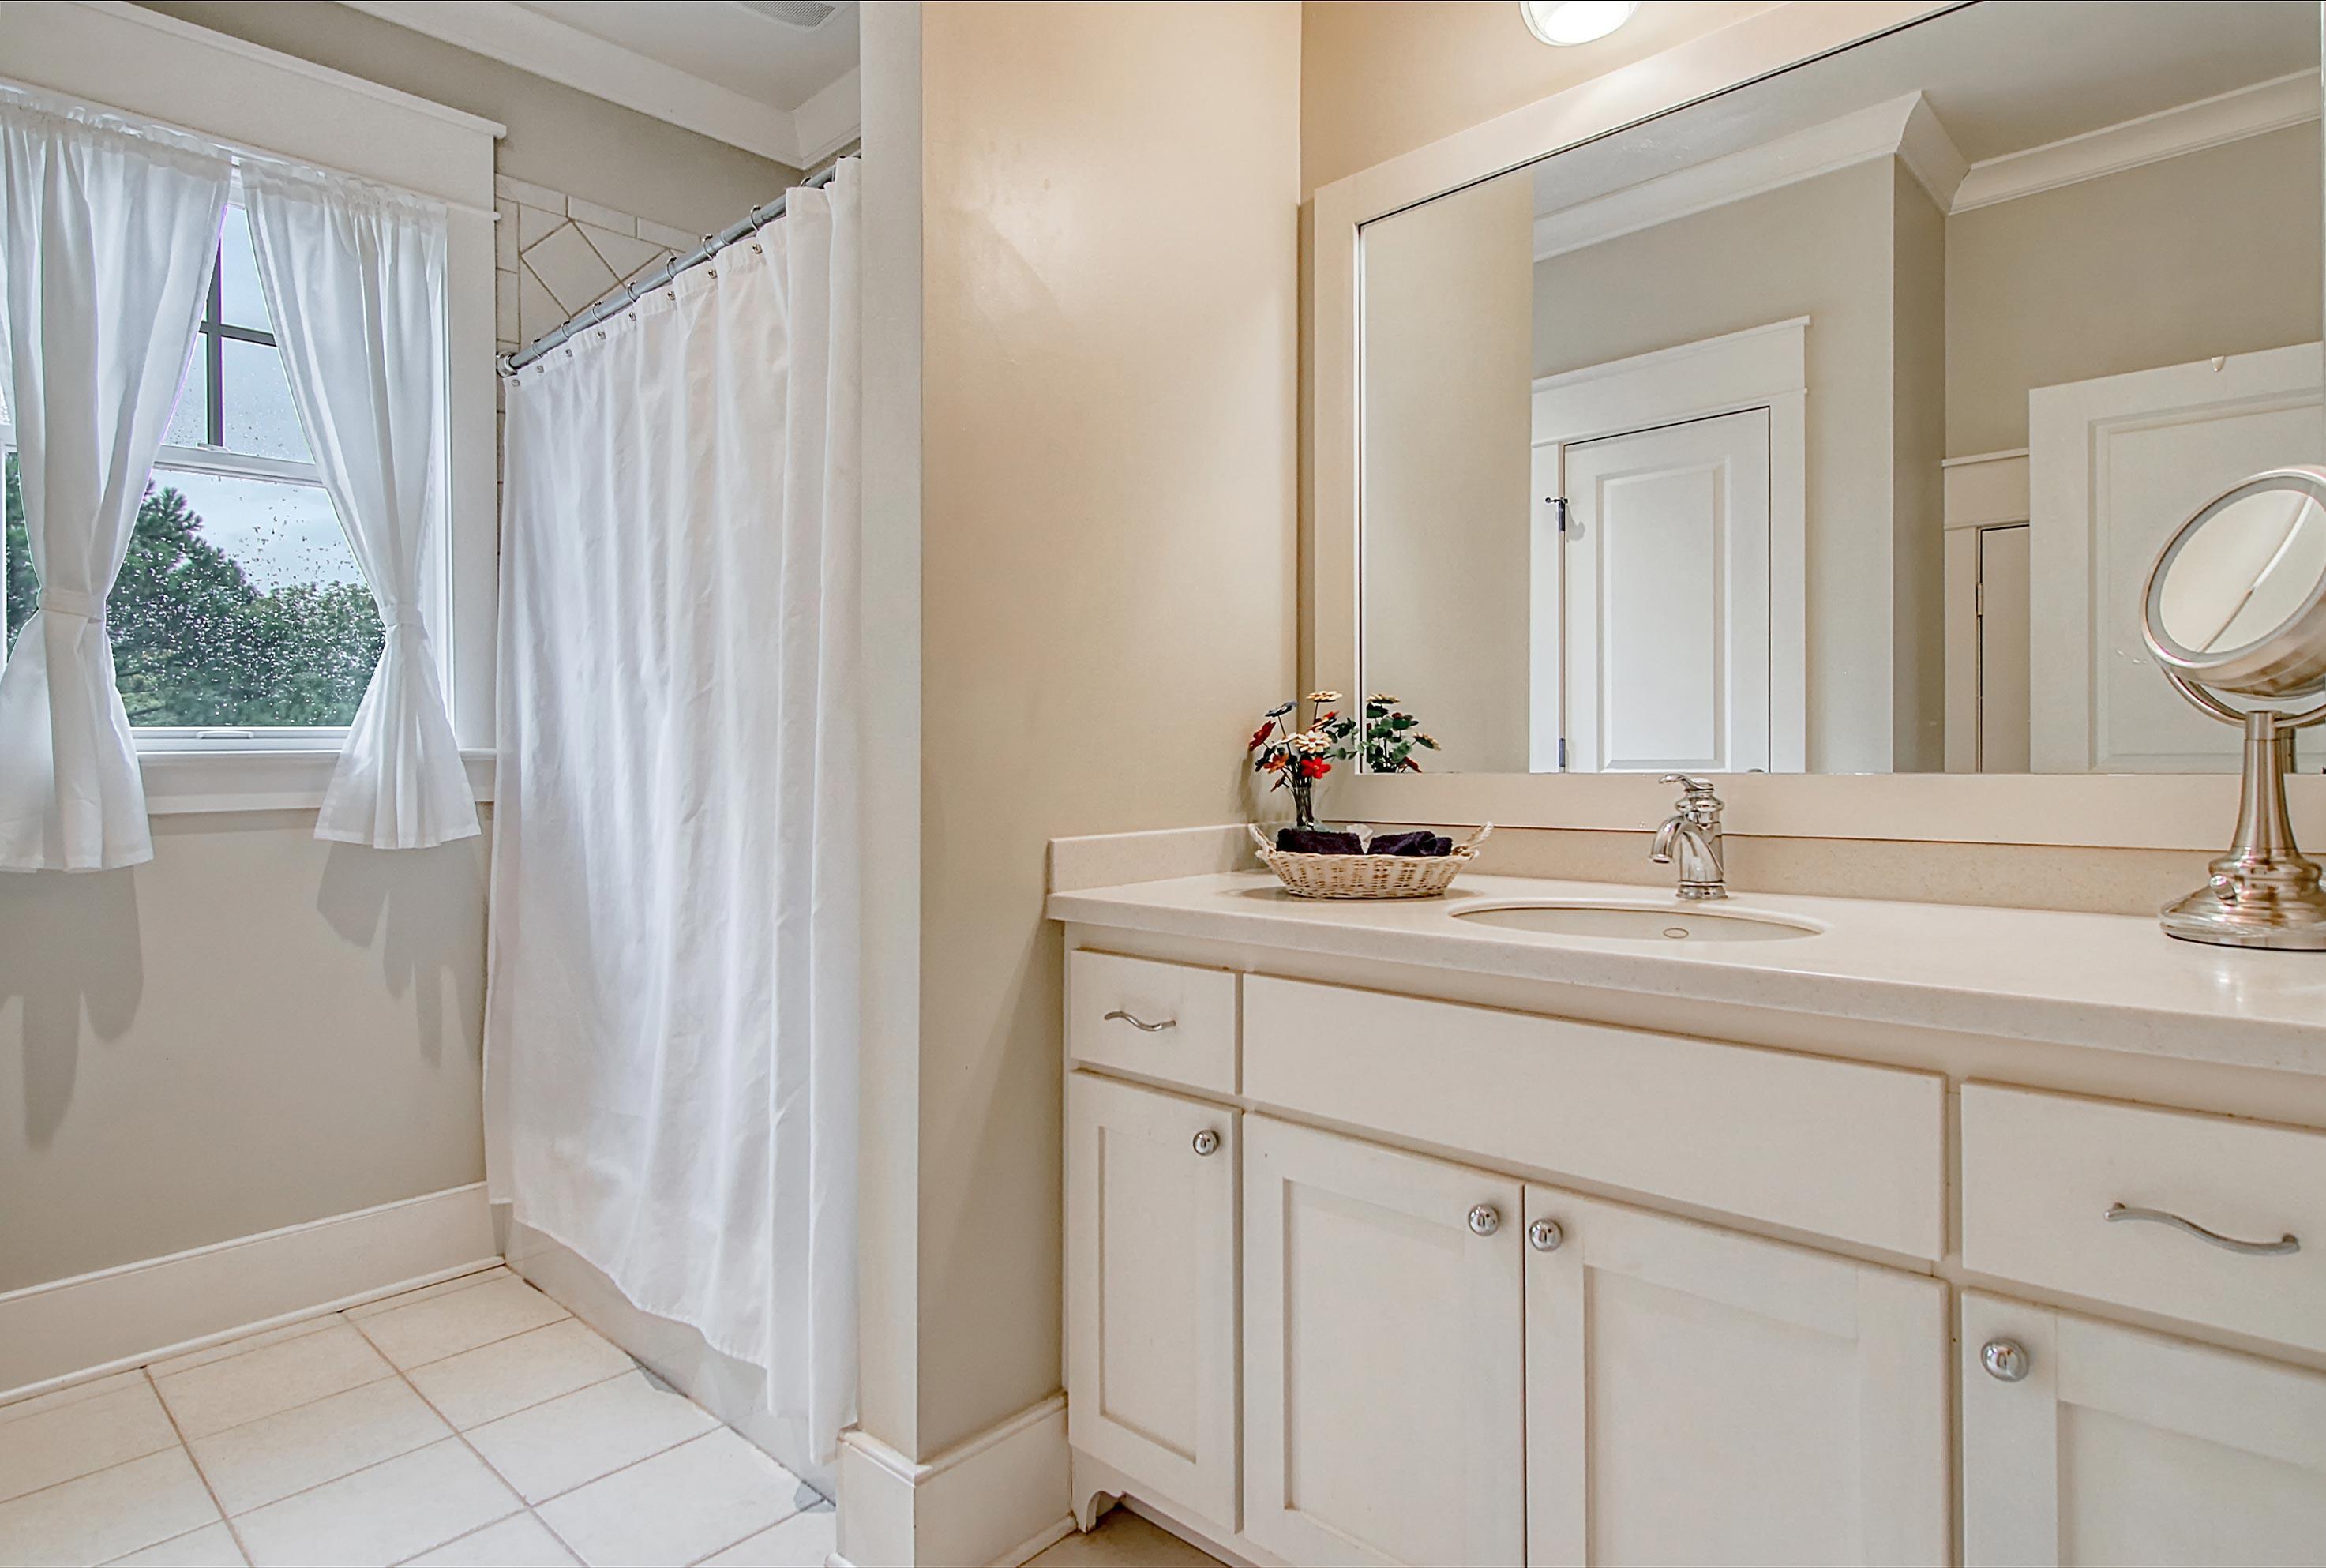 Scanlonville Homes For Sale - 152 6th, Mount Pleasant, SC - 78